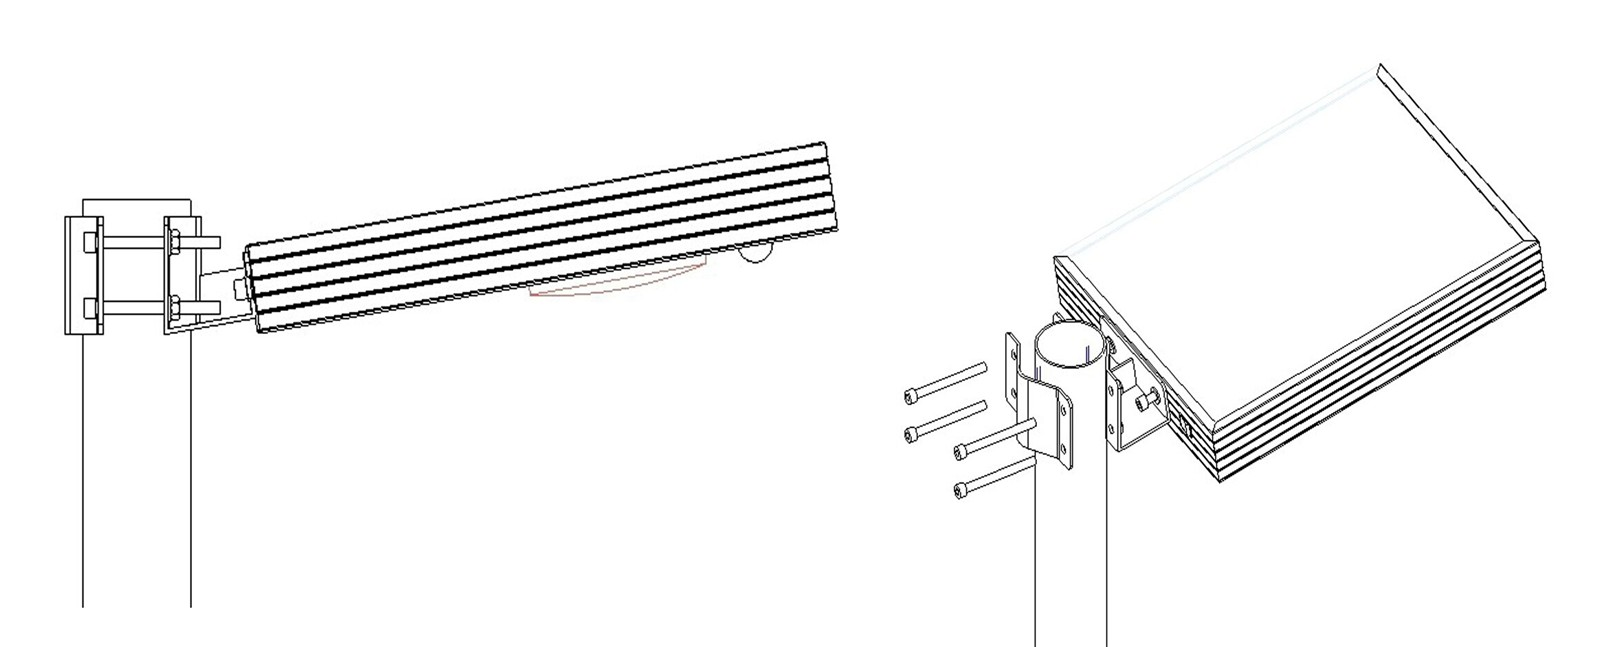 heat trace control panel wiring diagram heat trace symbol